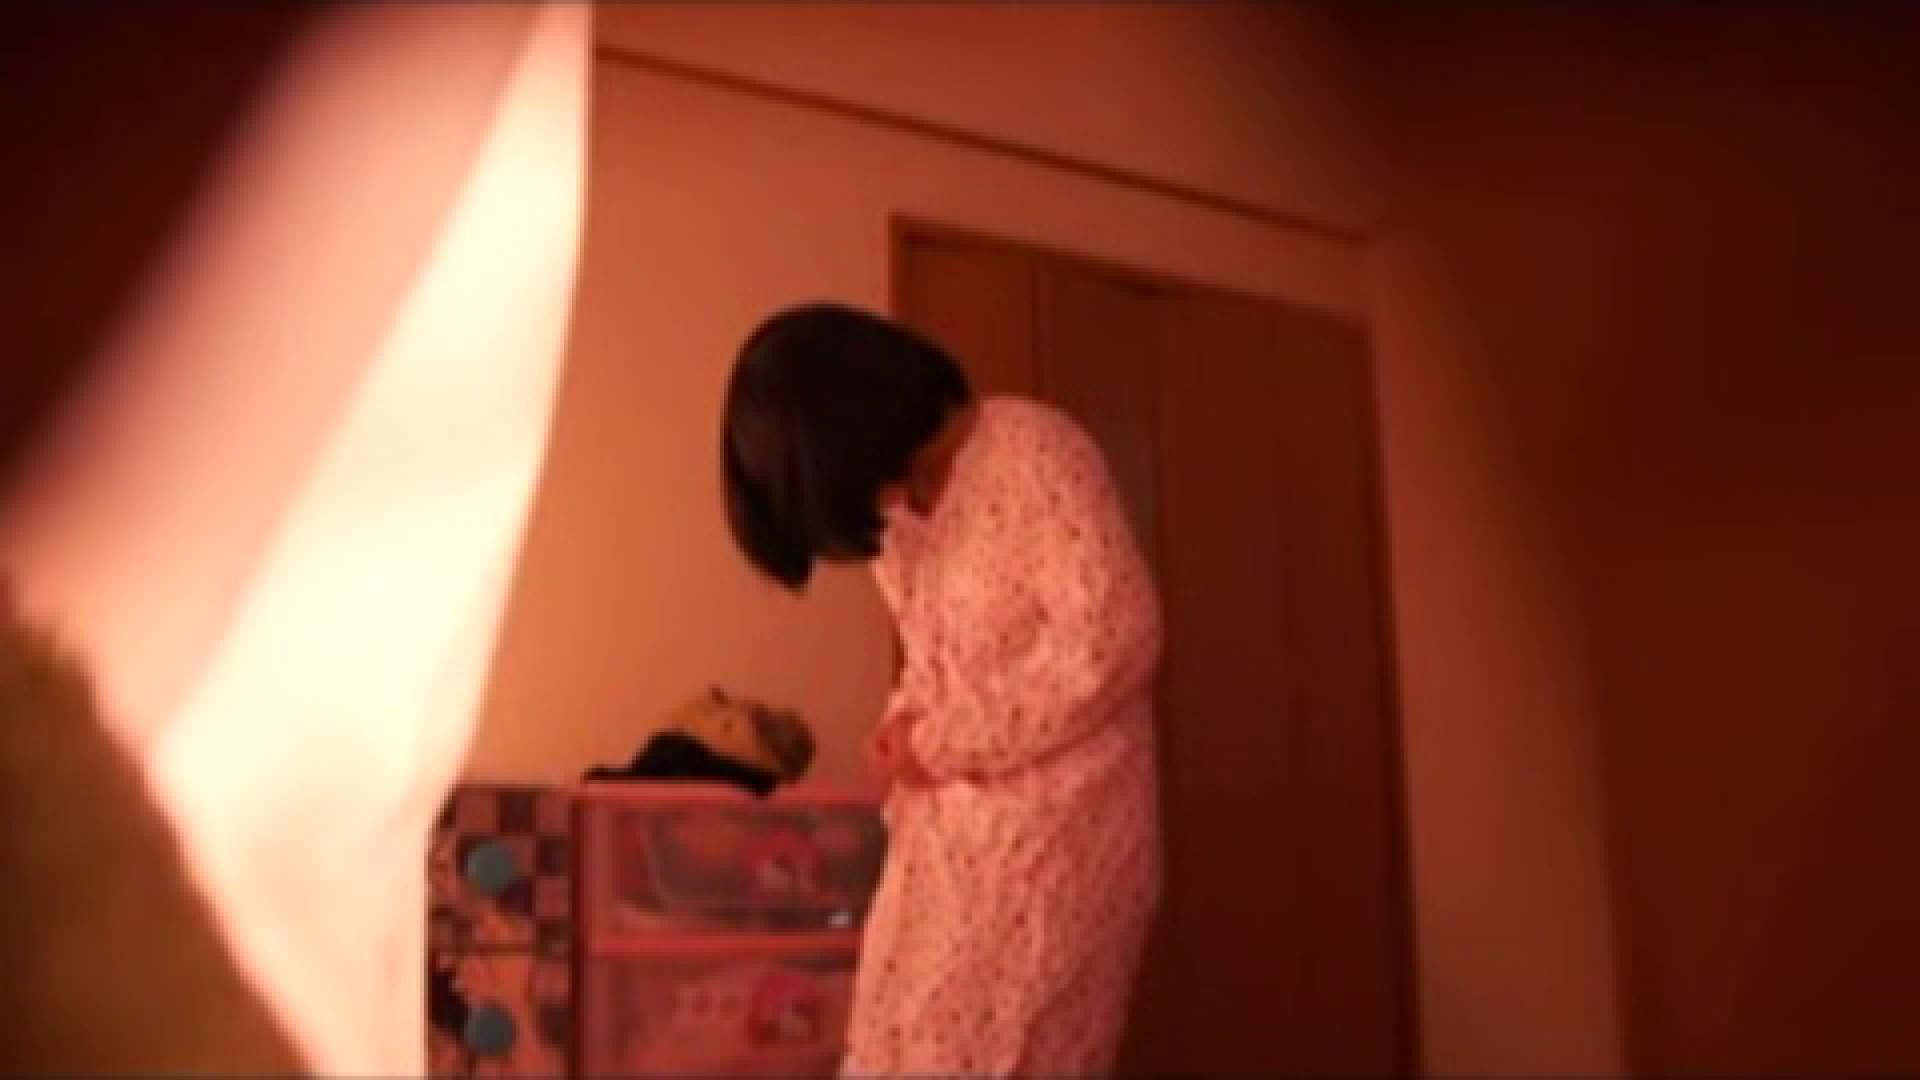 vol.2 まりこさんのお着替え、就寝前の映像です。 アラ30 戯れ無修正画像 71画像 13